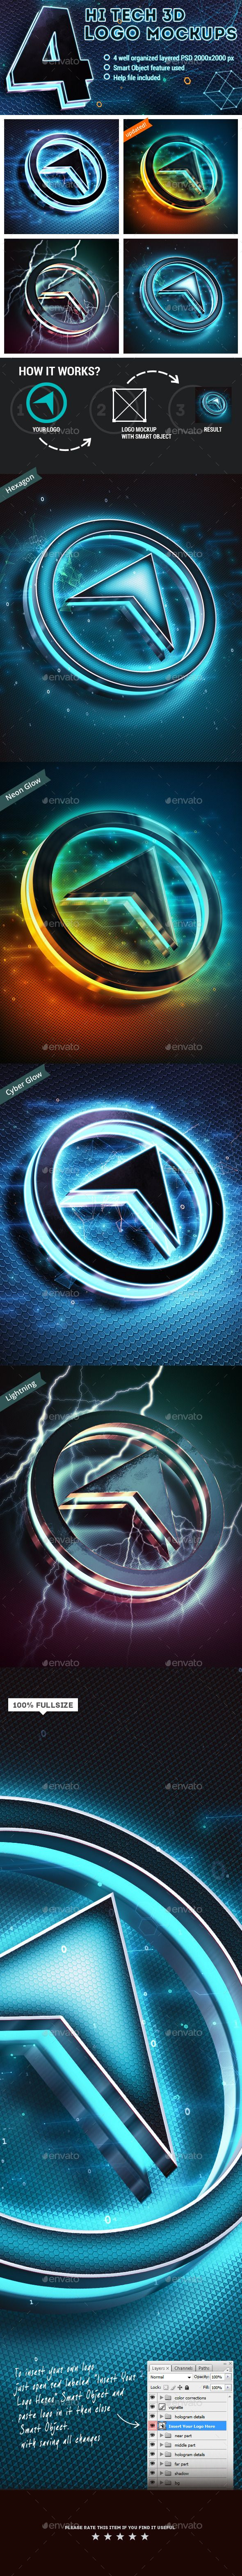 4 Hi-Tech 3D Logo Mockups  -  PSD Template • Download ➝ https://graphicriver.net/item/4-hitech-3d-logo-mockups/11969430?ref=pxcr